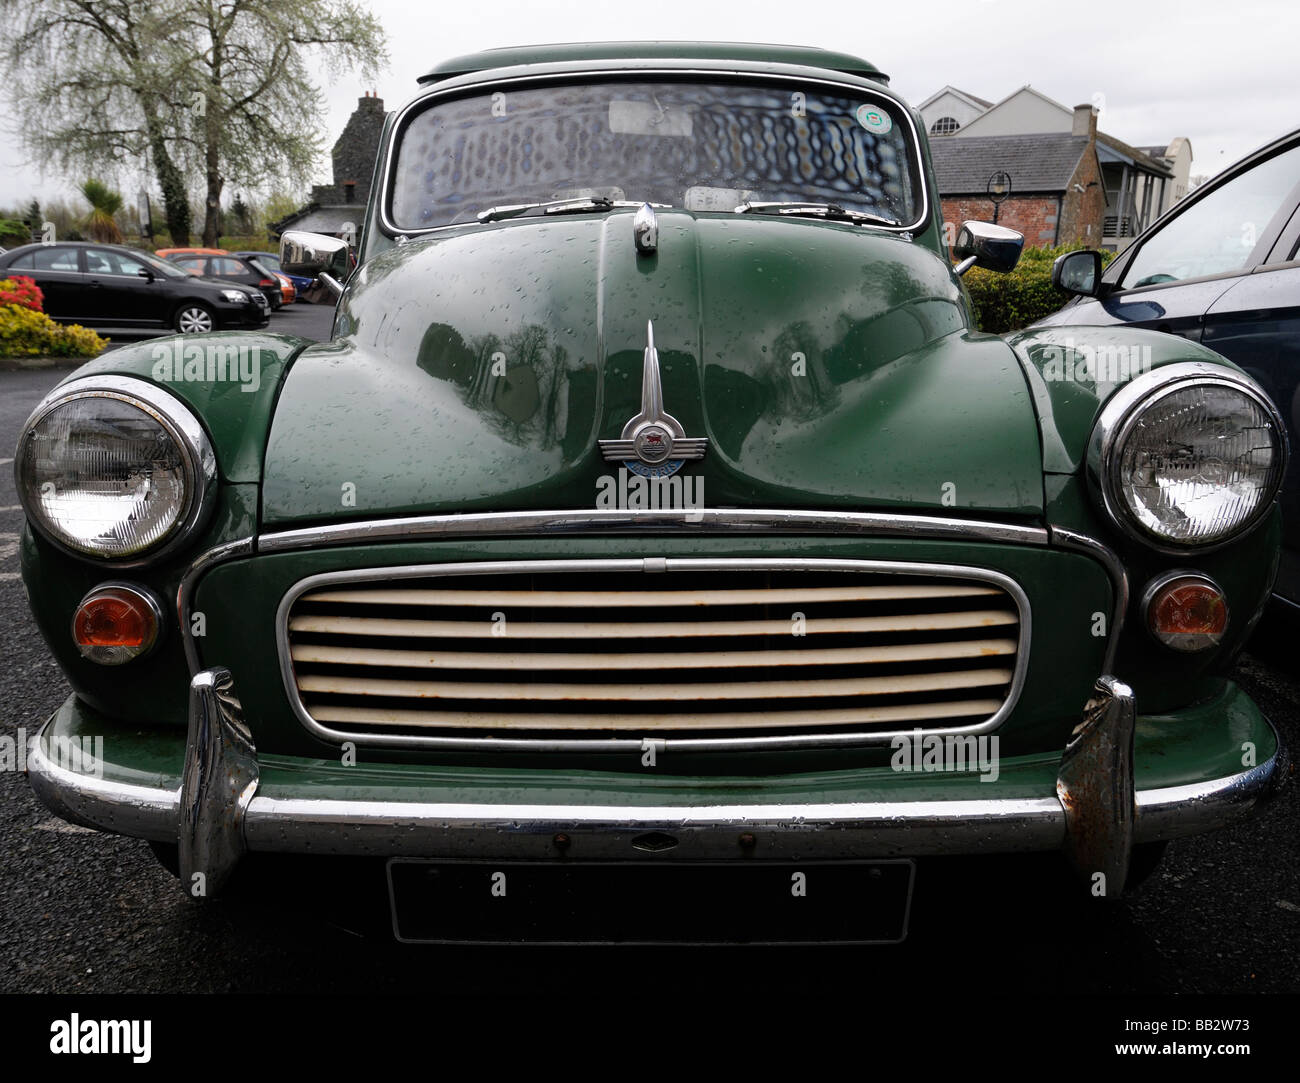 Morris Minor old car classic vintage model quaint charm charming ...